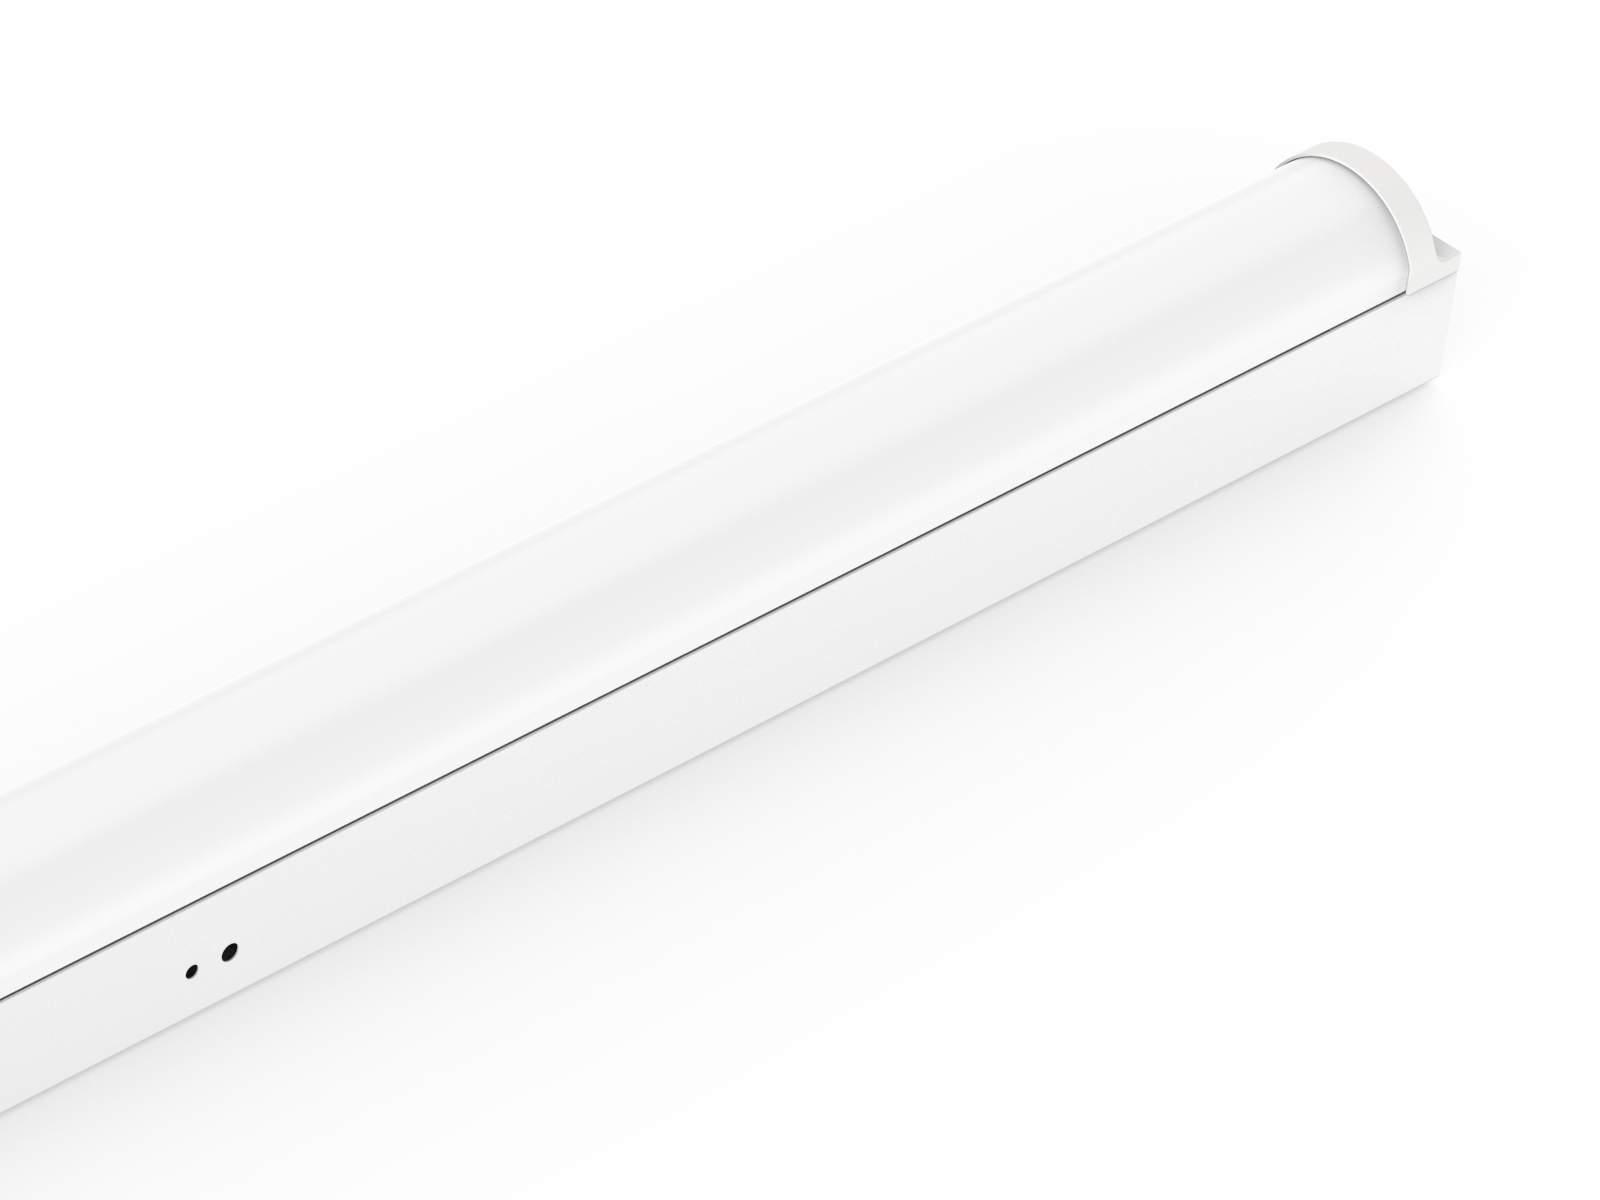 LED luminaire PROLUMEN DB09 1200 white  25W 2620lm  120° IP54 pure white 4000K